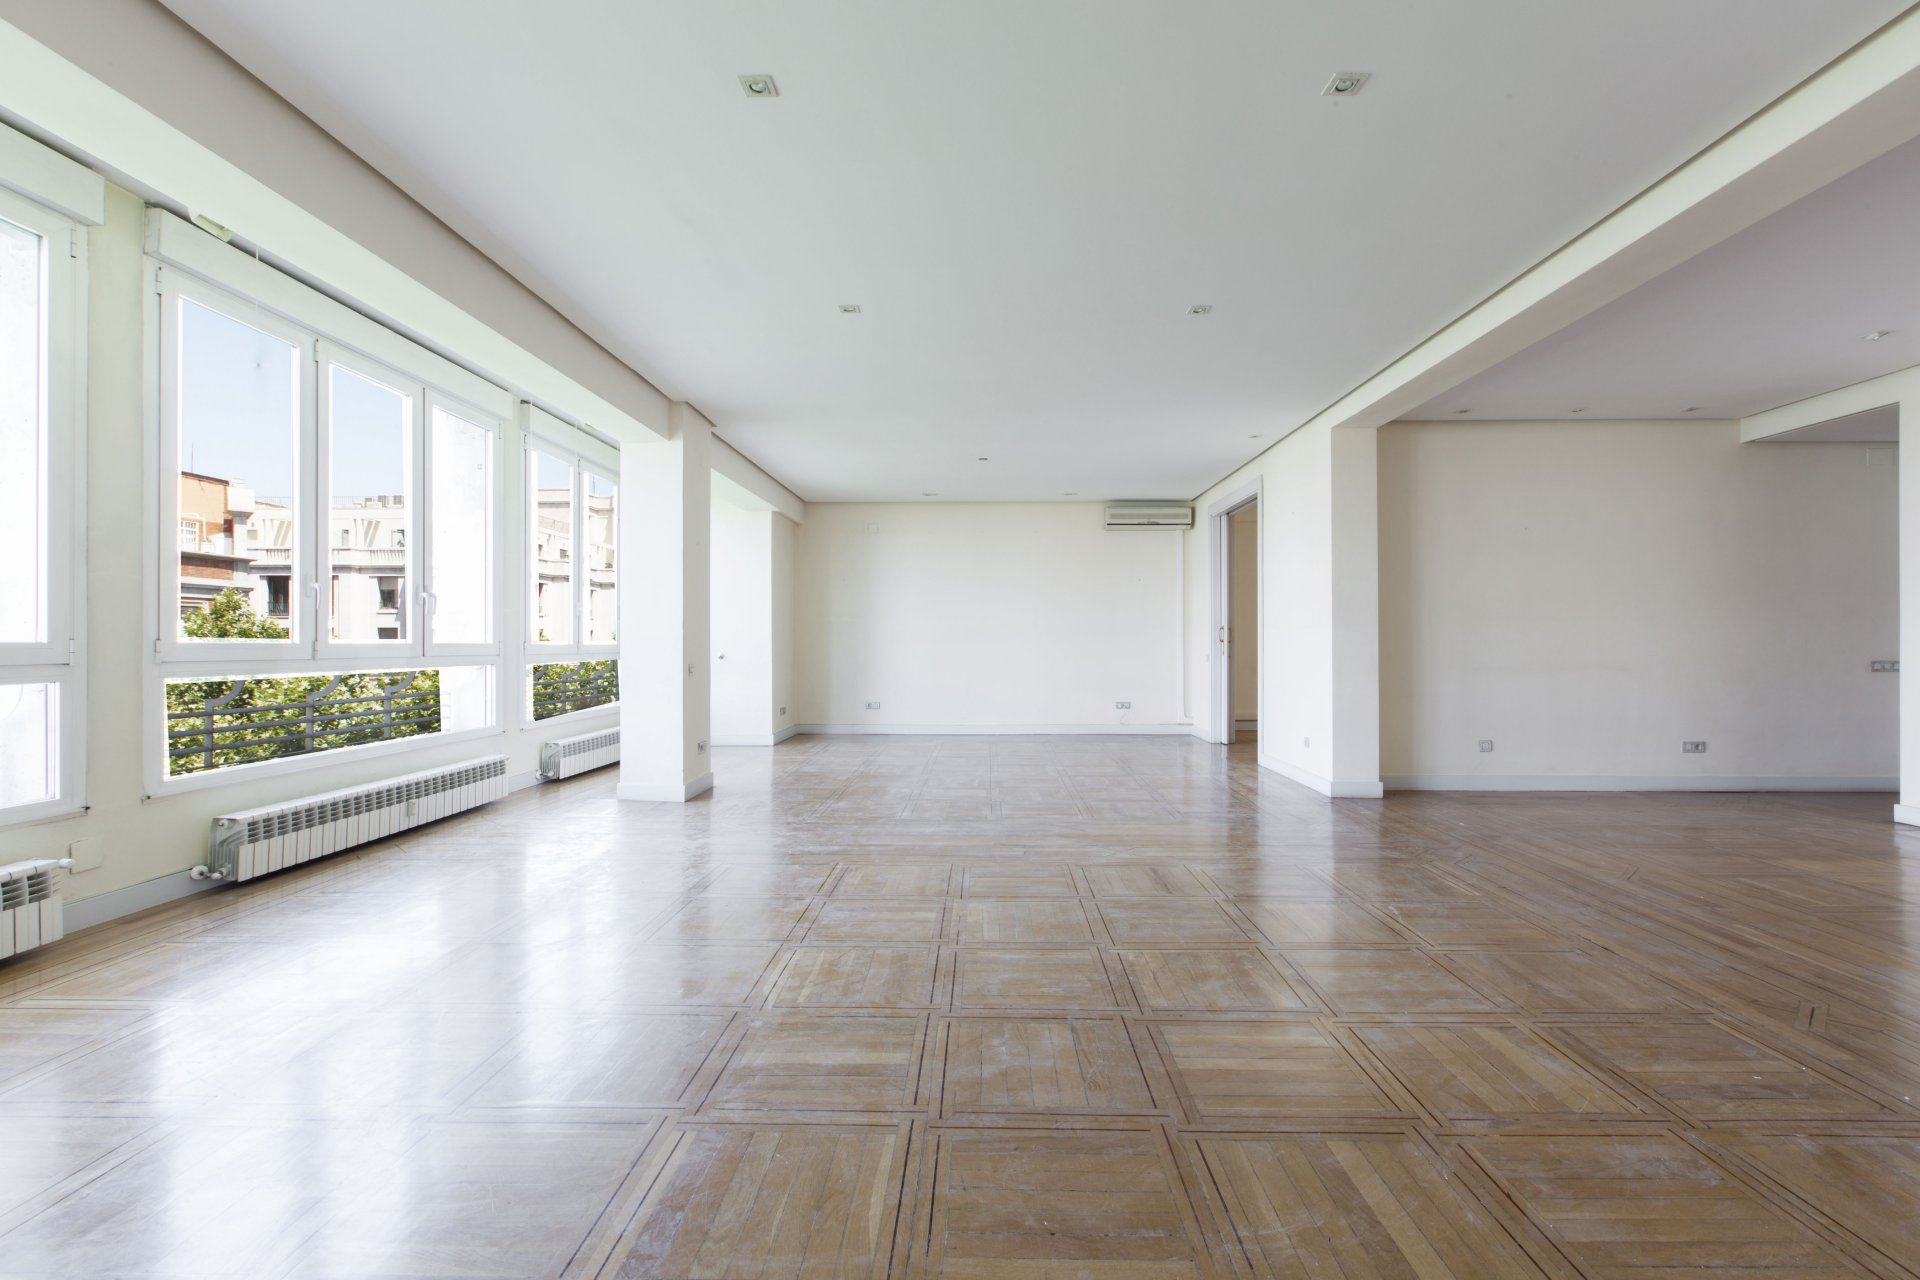 Anuncio alquiler piso madrid recoletos 28000 john taylor for Piso madrid alquiler